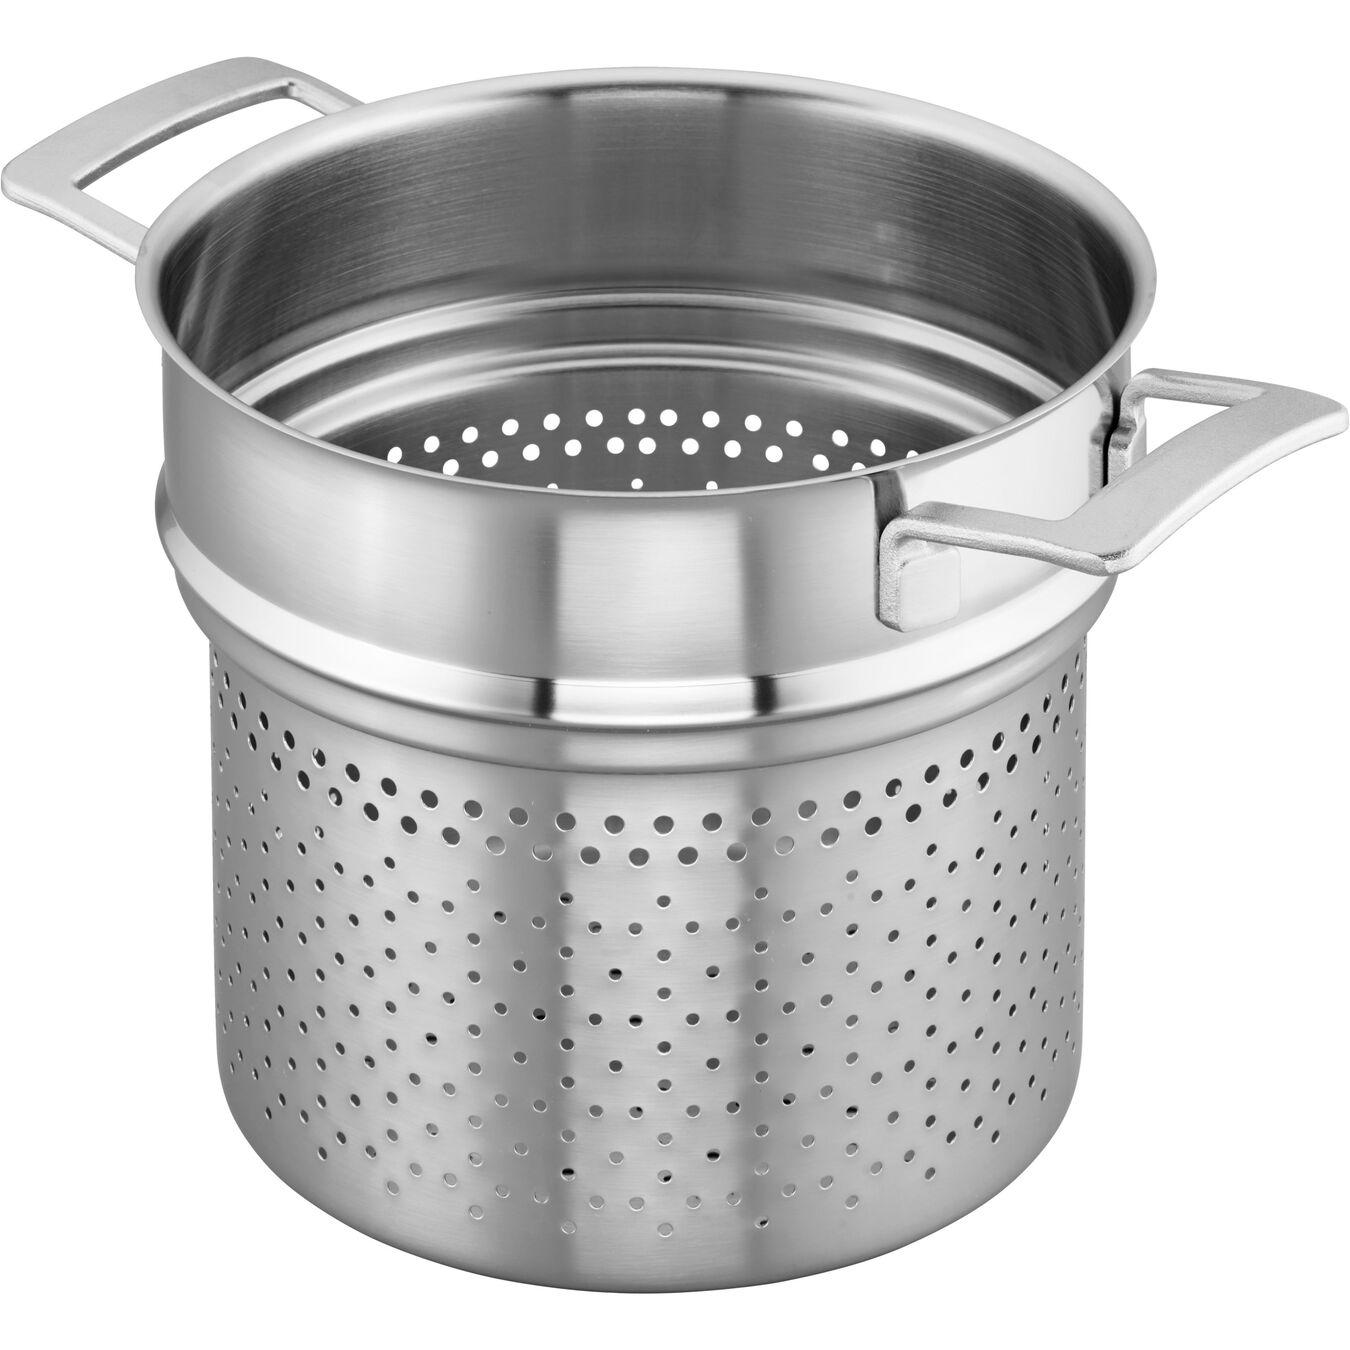 8-qt Stainless Steel Pasta Insert (Fits 8-qt Stock Pot),,large 3